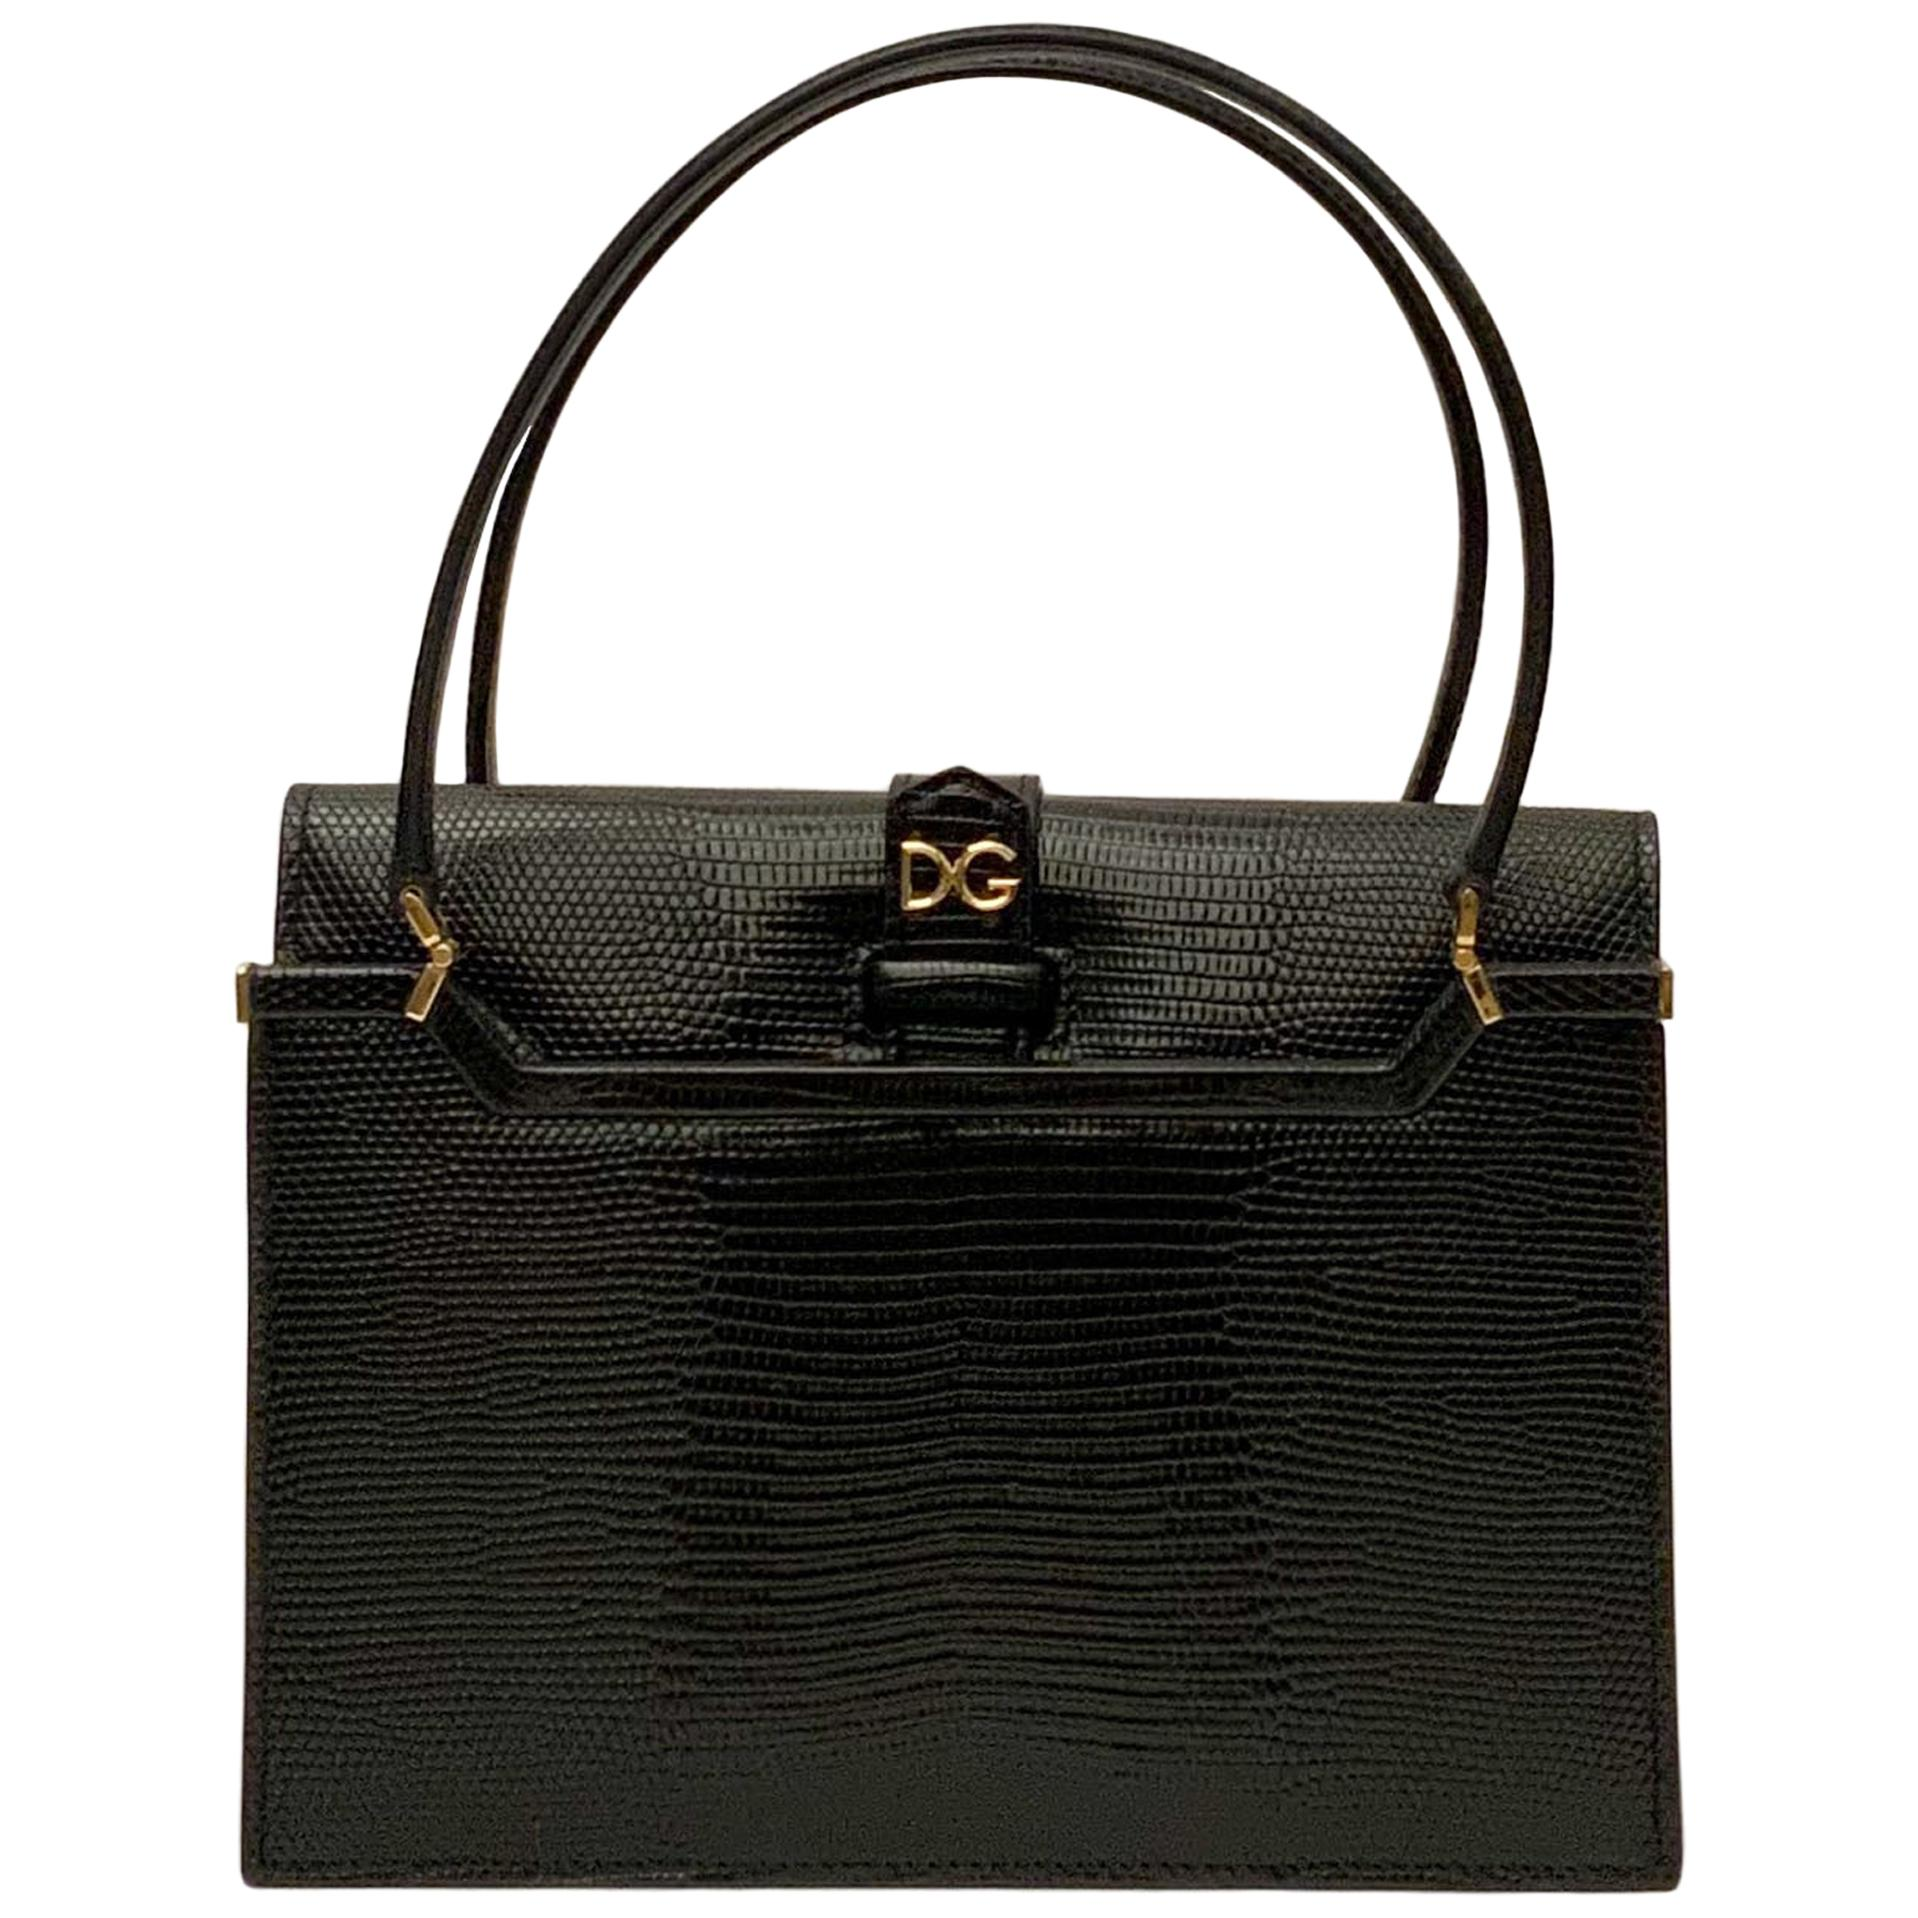 Dolce & Gabbana 2020 Small Iguana Print Ingrid Bag